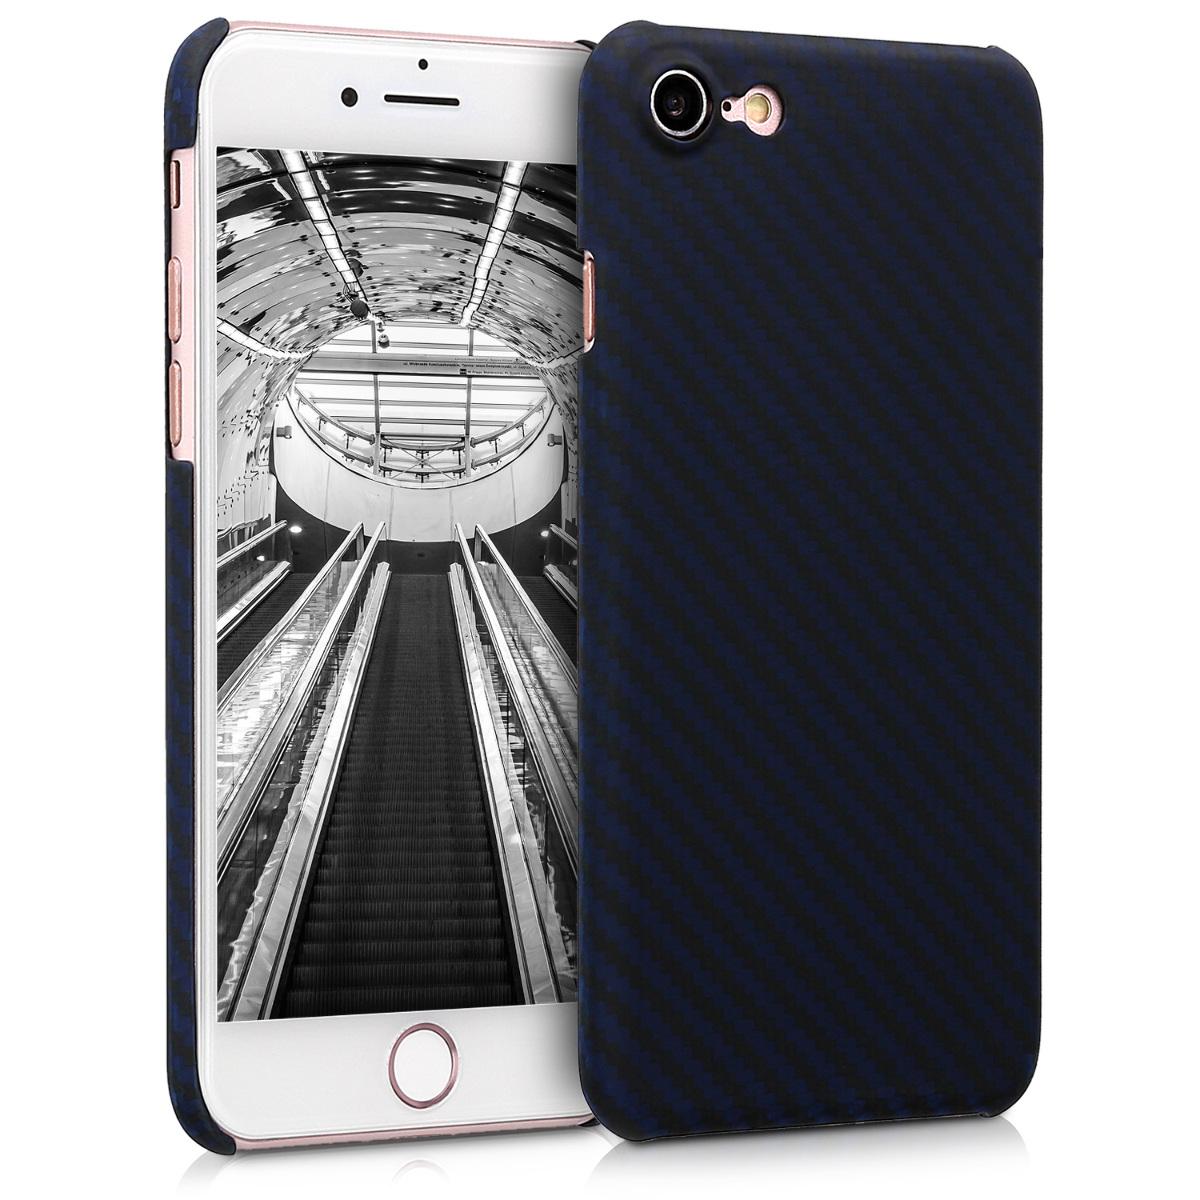 Kalibri Aramid Fiber Body - Σκληρή Θήκη iPhone 8 / 7 - Dark Blue Matte (42082.53)